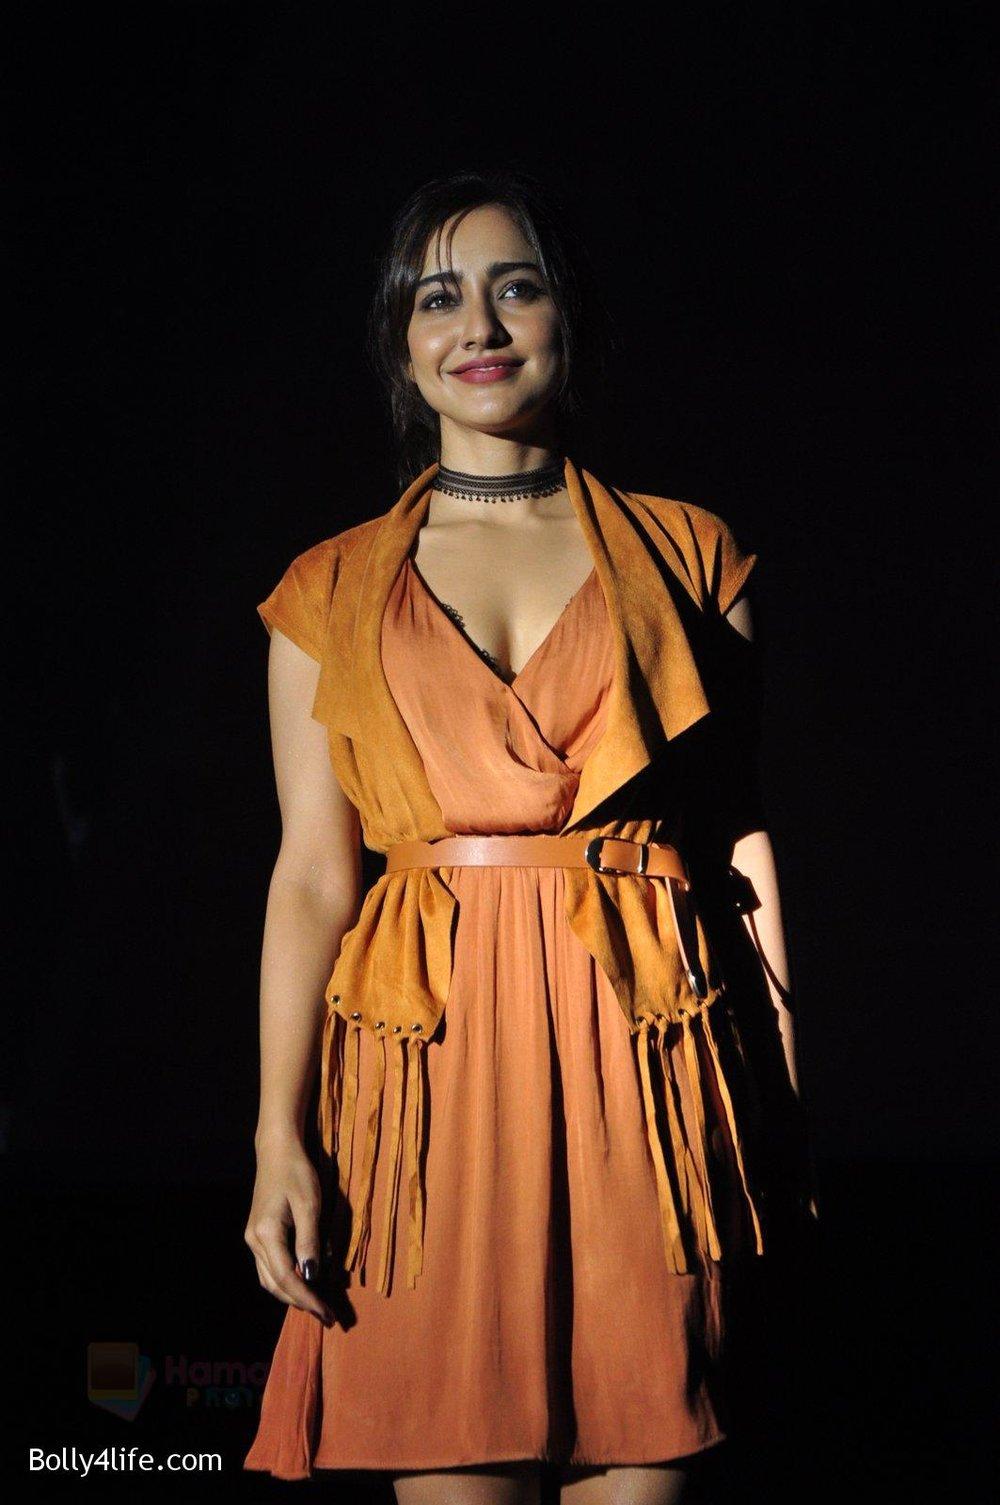 Neha-Sharma-at-the-Audio-release-of-Tum-Bin-2-on-14th-Sept-2016-120.jpg